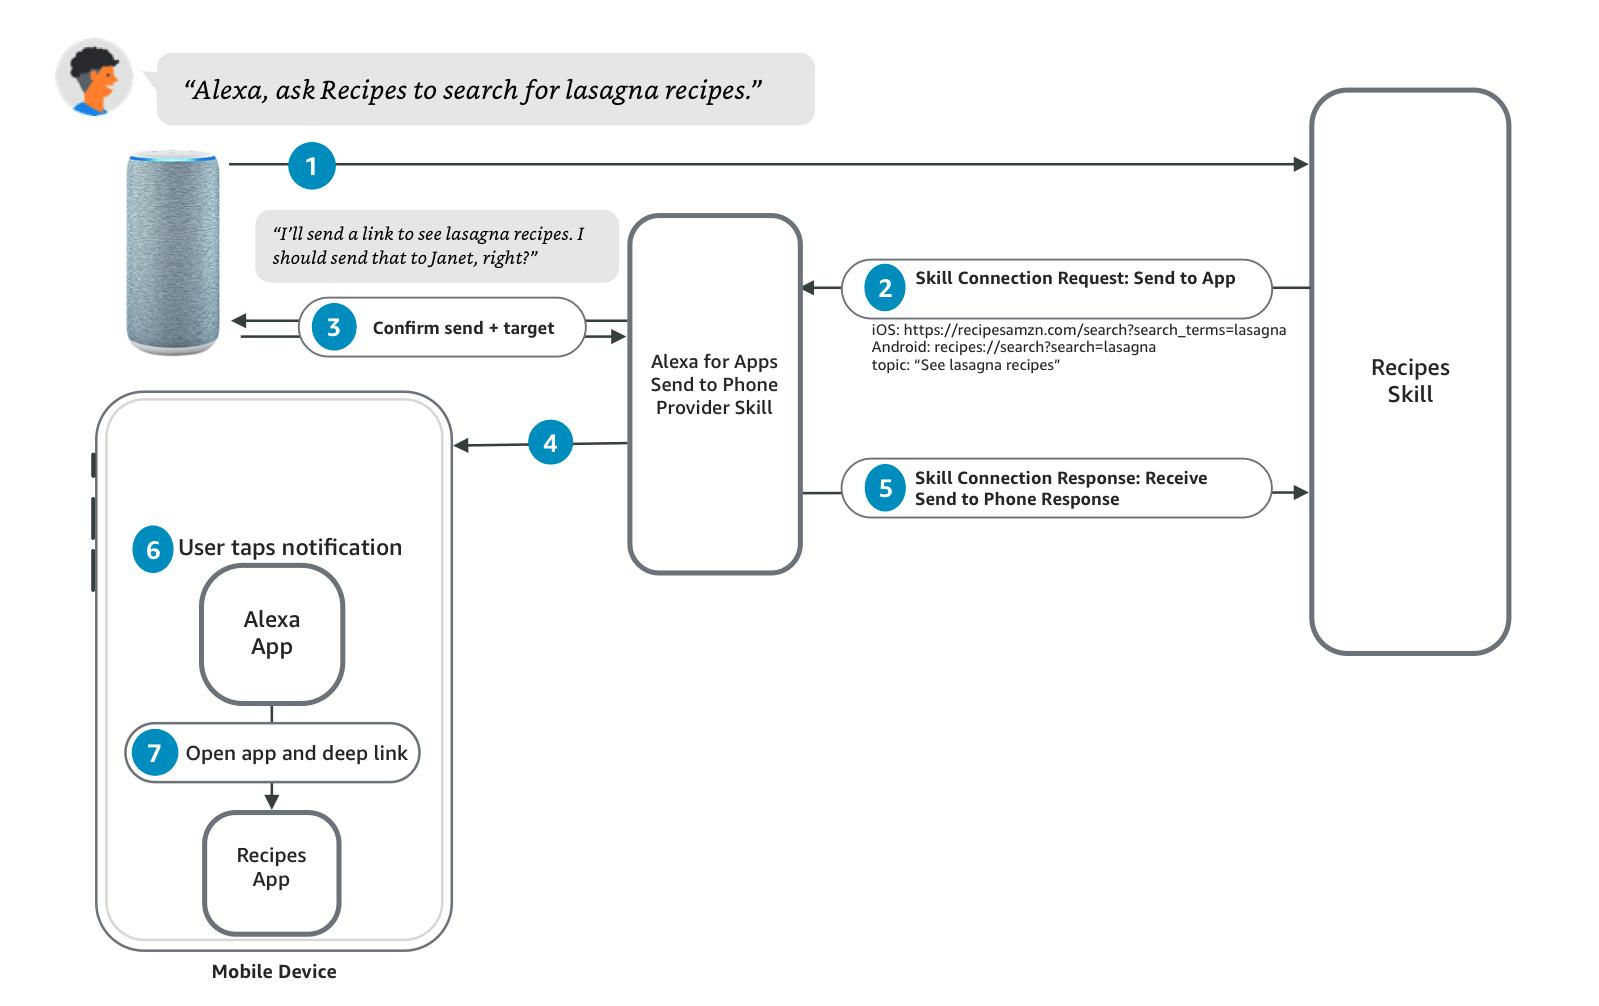 Alexa for Apps non-mobile experience